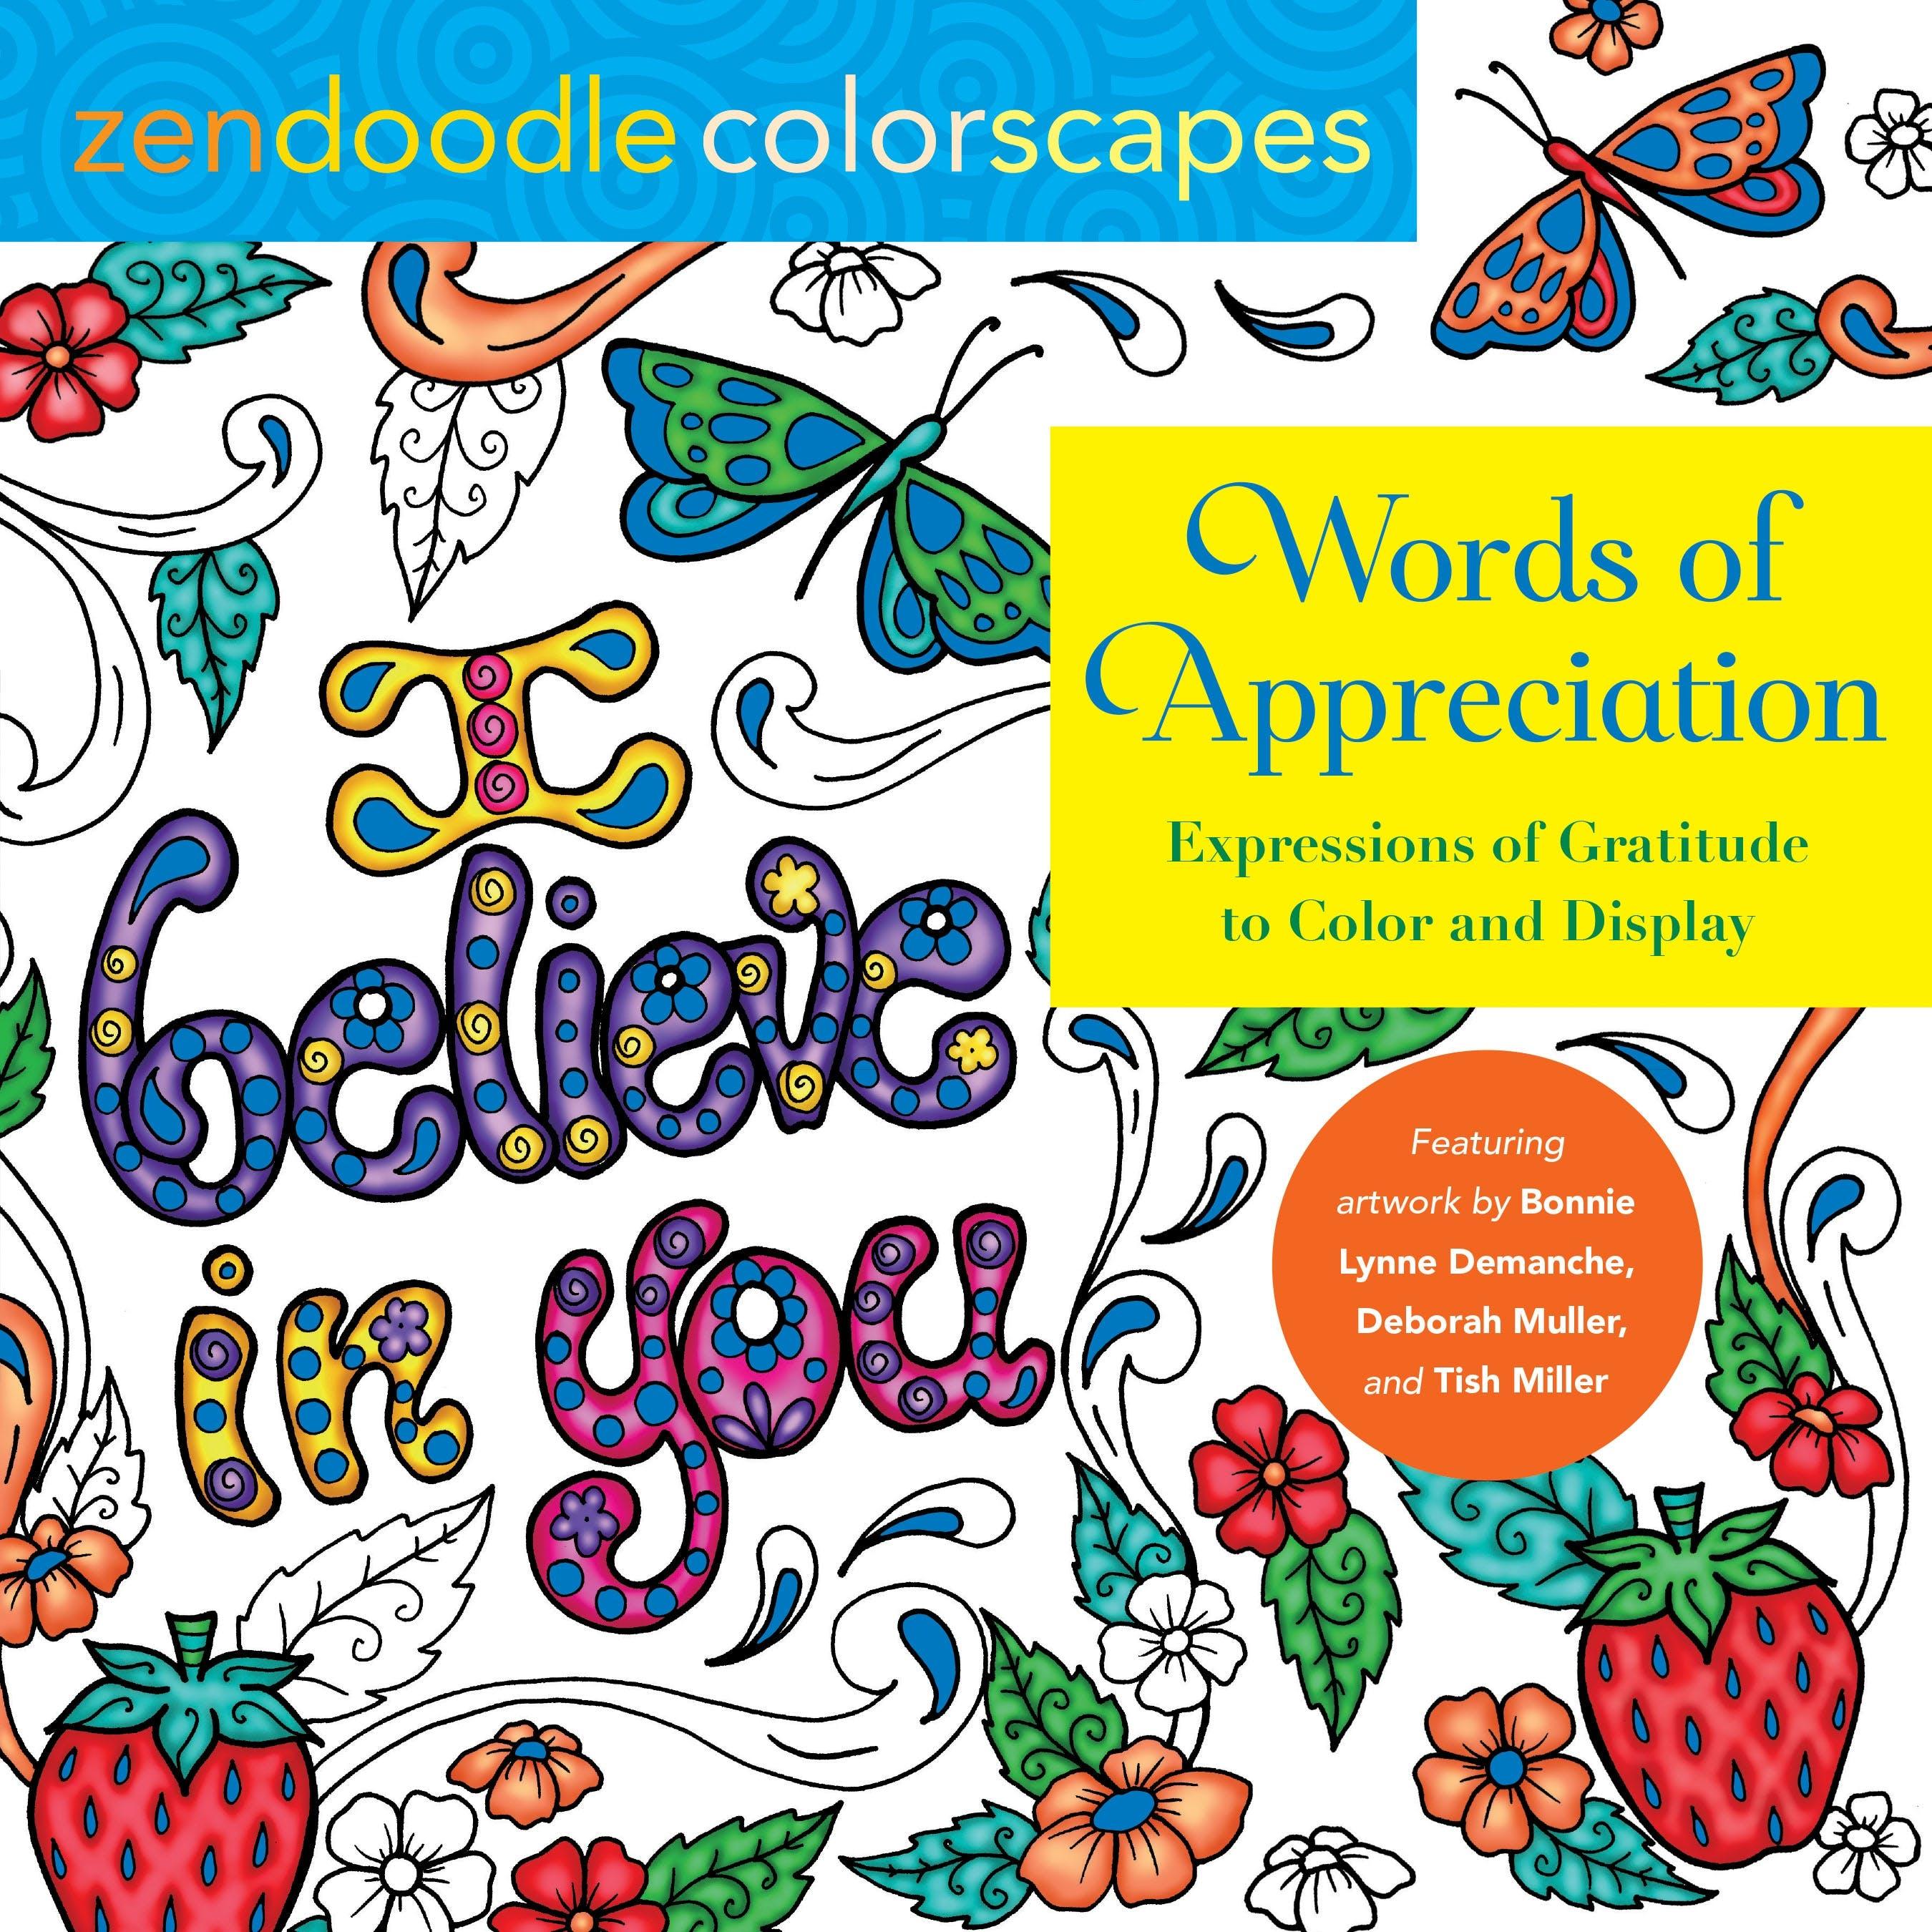 Image of Zendoodle Colorscapes: Words of Appreciation